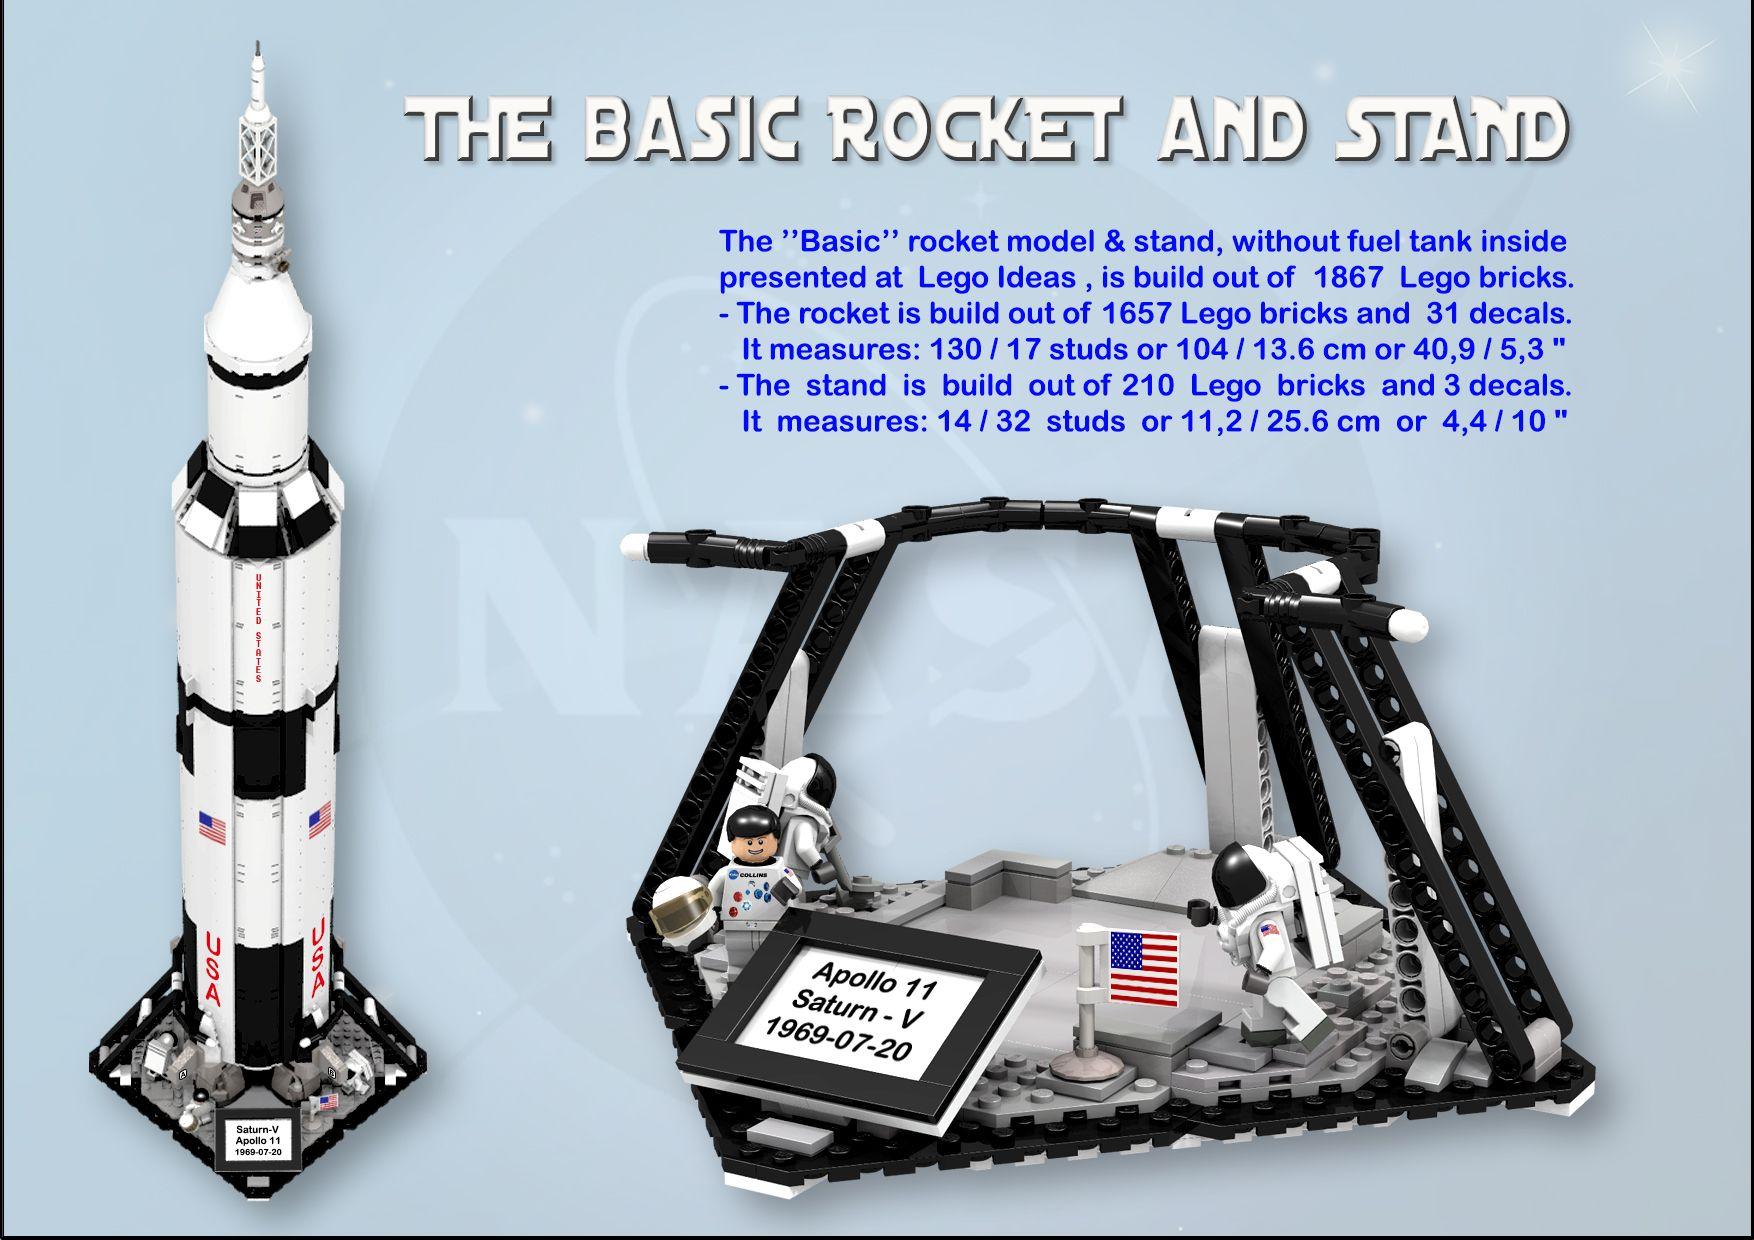 Apollo 11 Saturn V Apollo 11 Apollo 11 Moon Landing Lego Universe